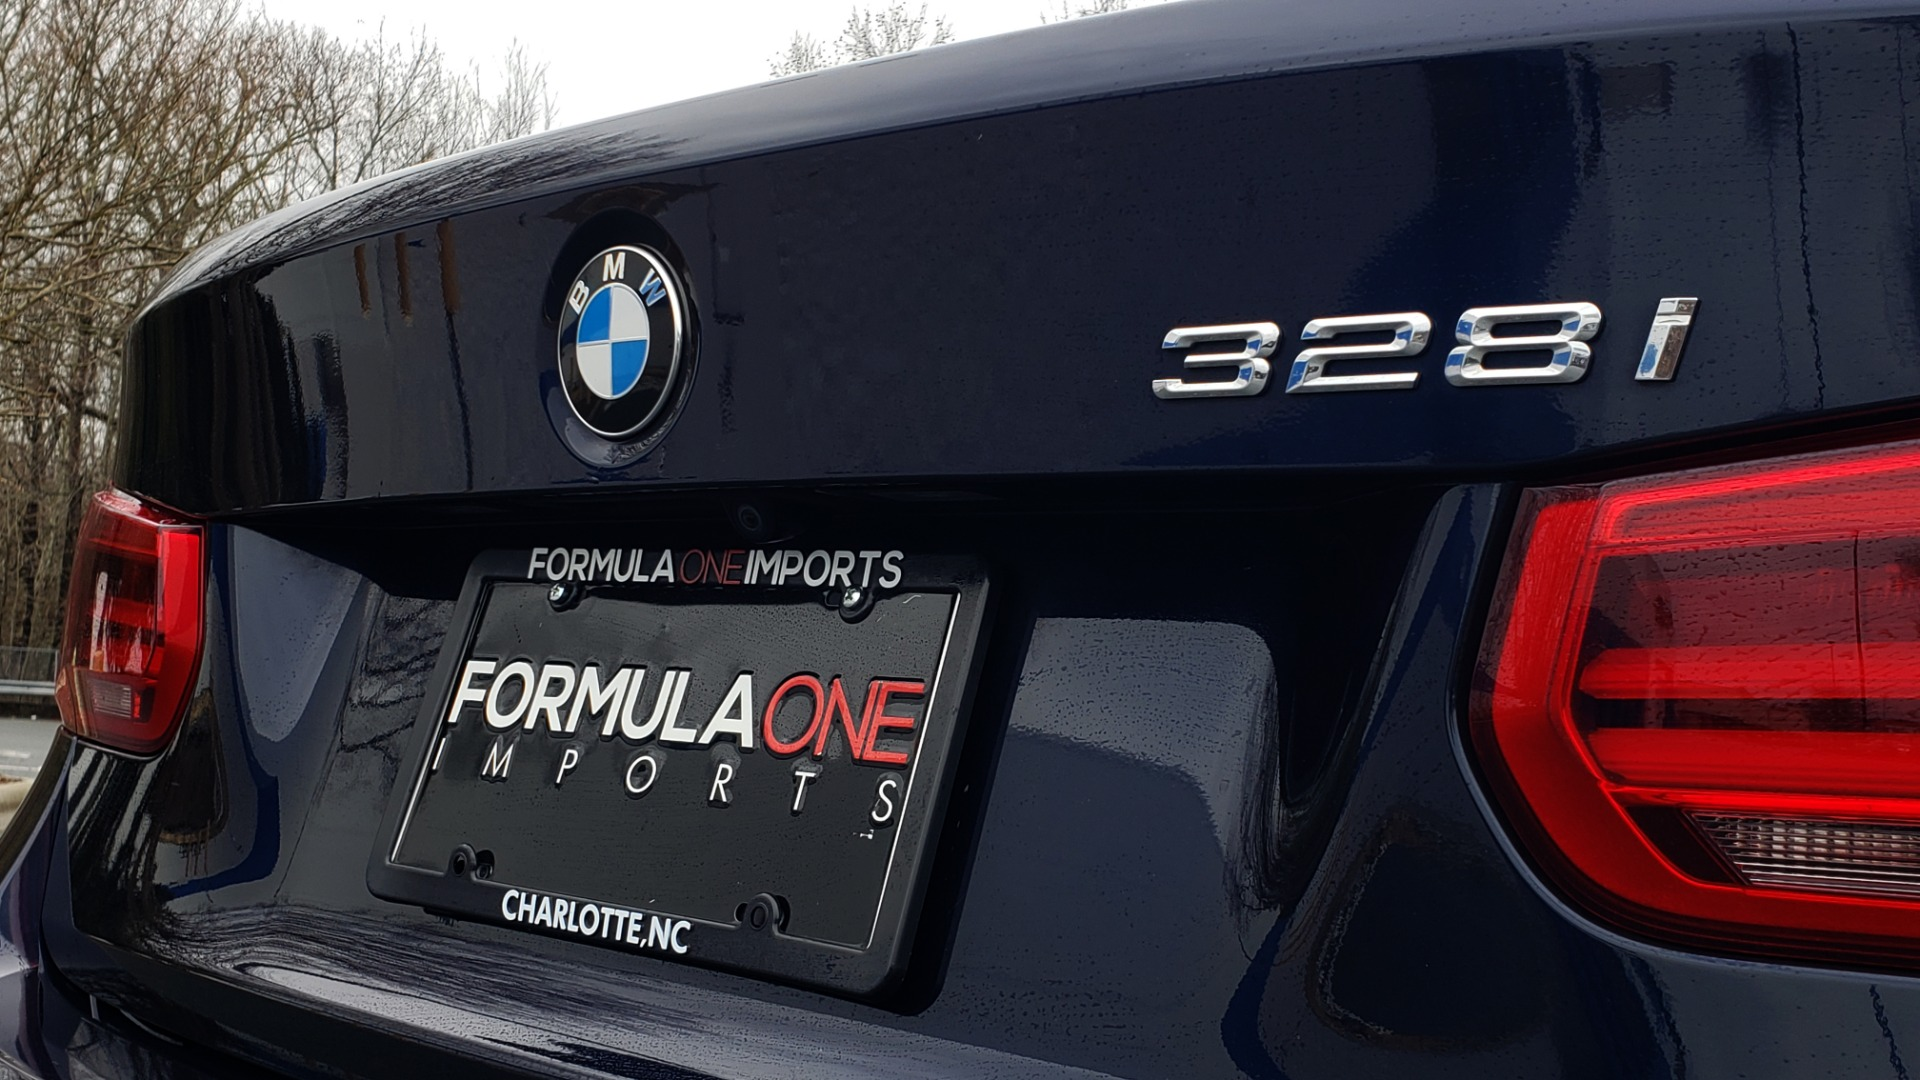 Used 2016 BMW 3 SERIES 328I PREMIUM PKG / DRVR ASST / SUNROOF / PARK ASST for sale Sold at Formula Imports in Charlotte NC 28227 29